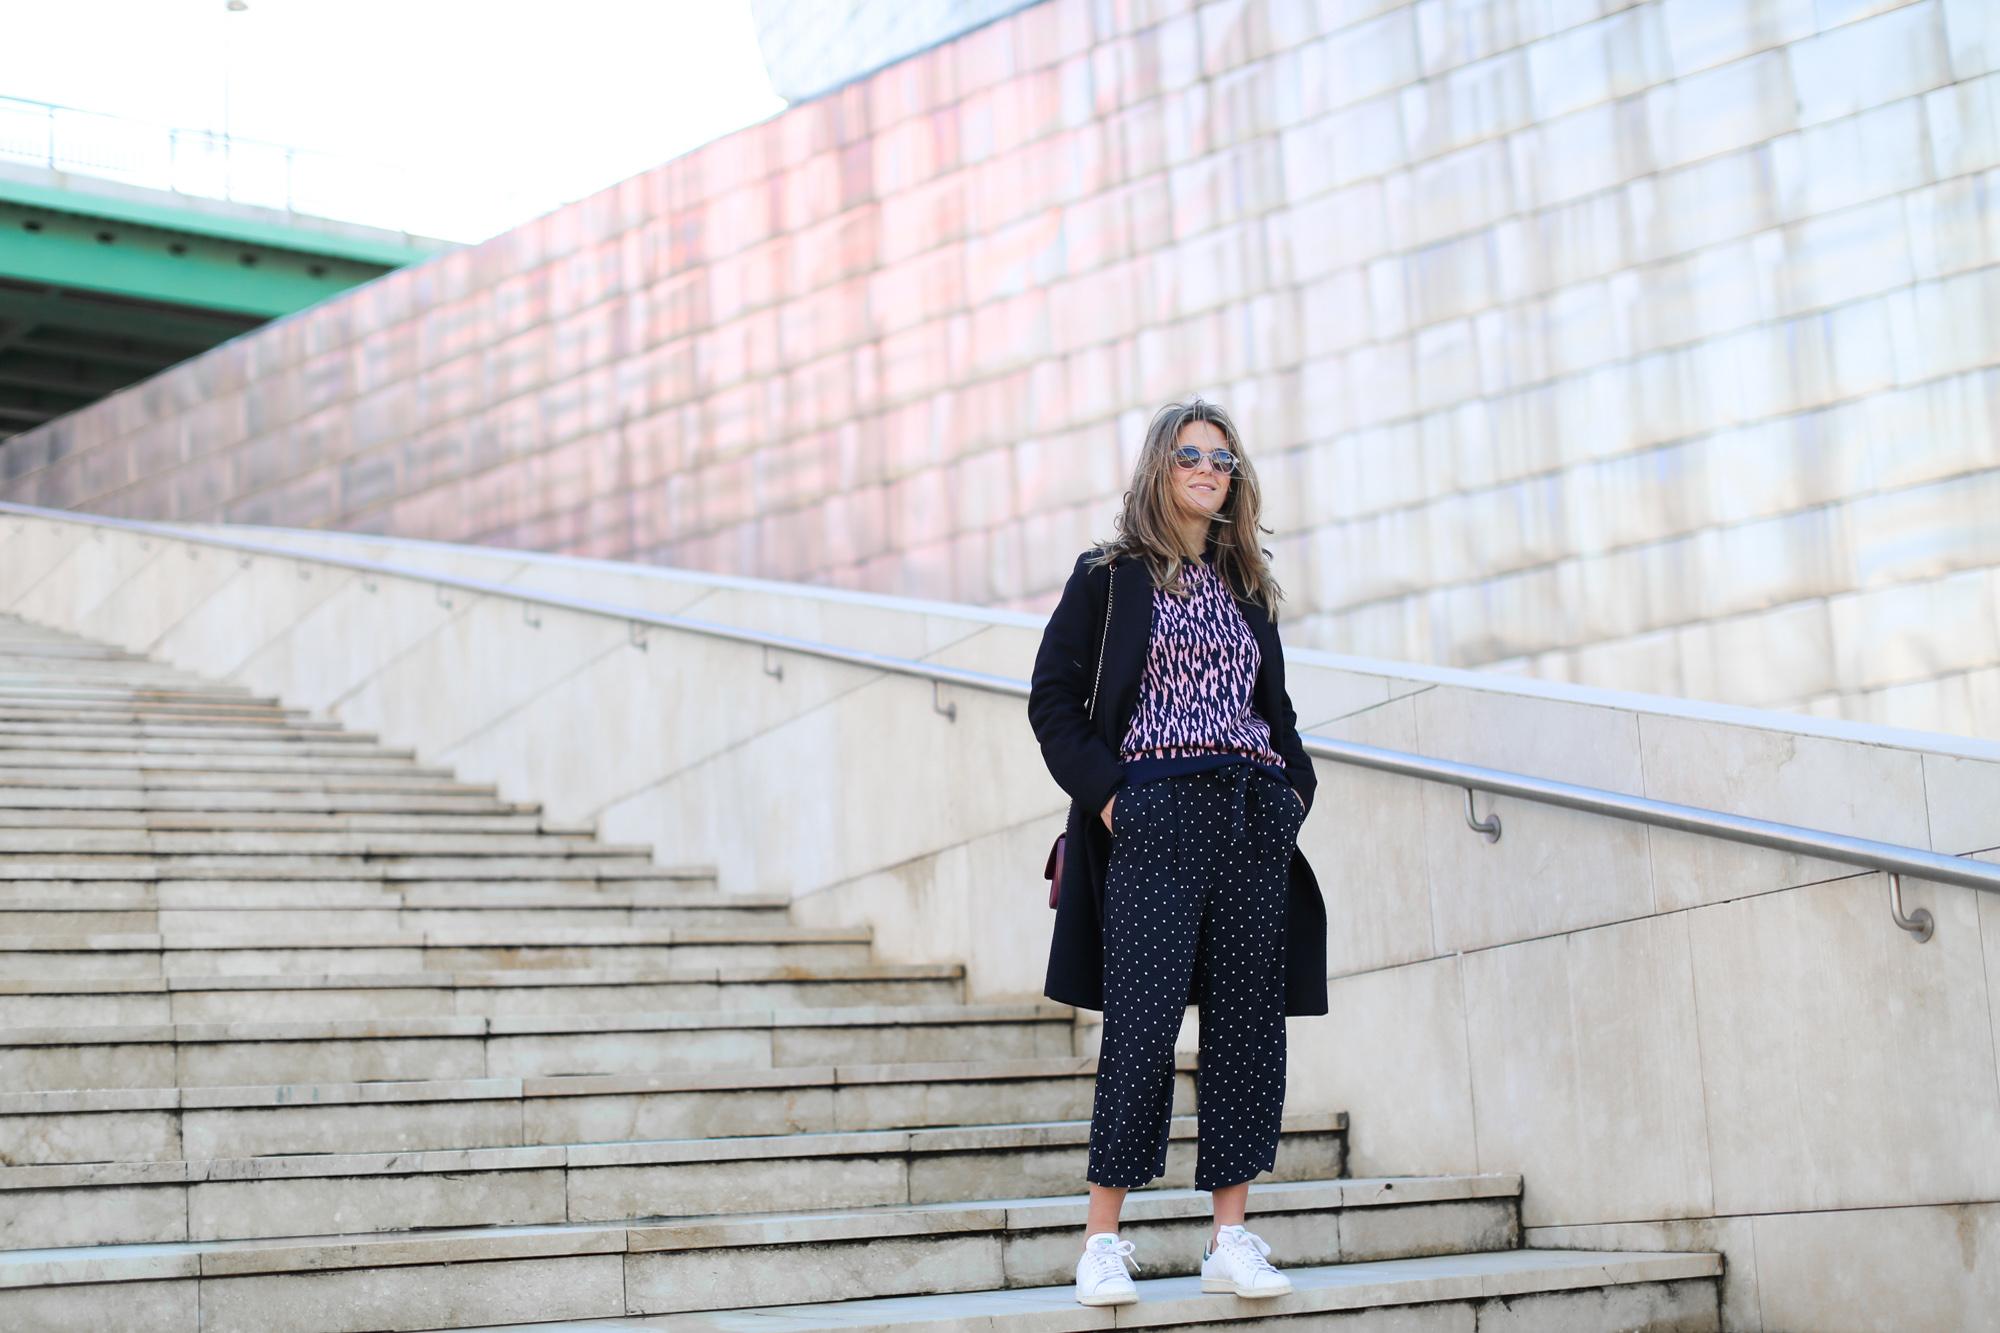 Clochet_streetstyle_fashionblogger_andotherstories_merinowooljacquardsweater_leopardprintpinkandblue_adidasstansmith-2